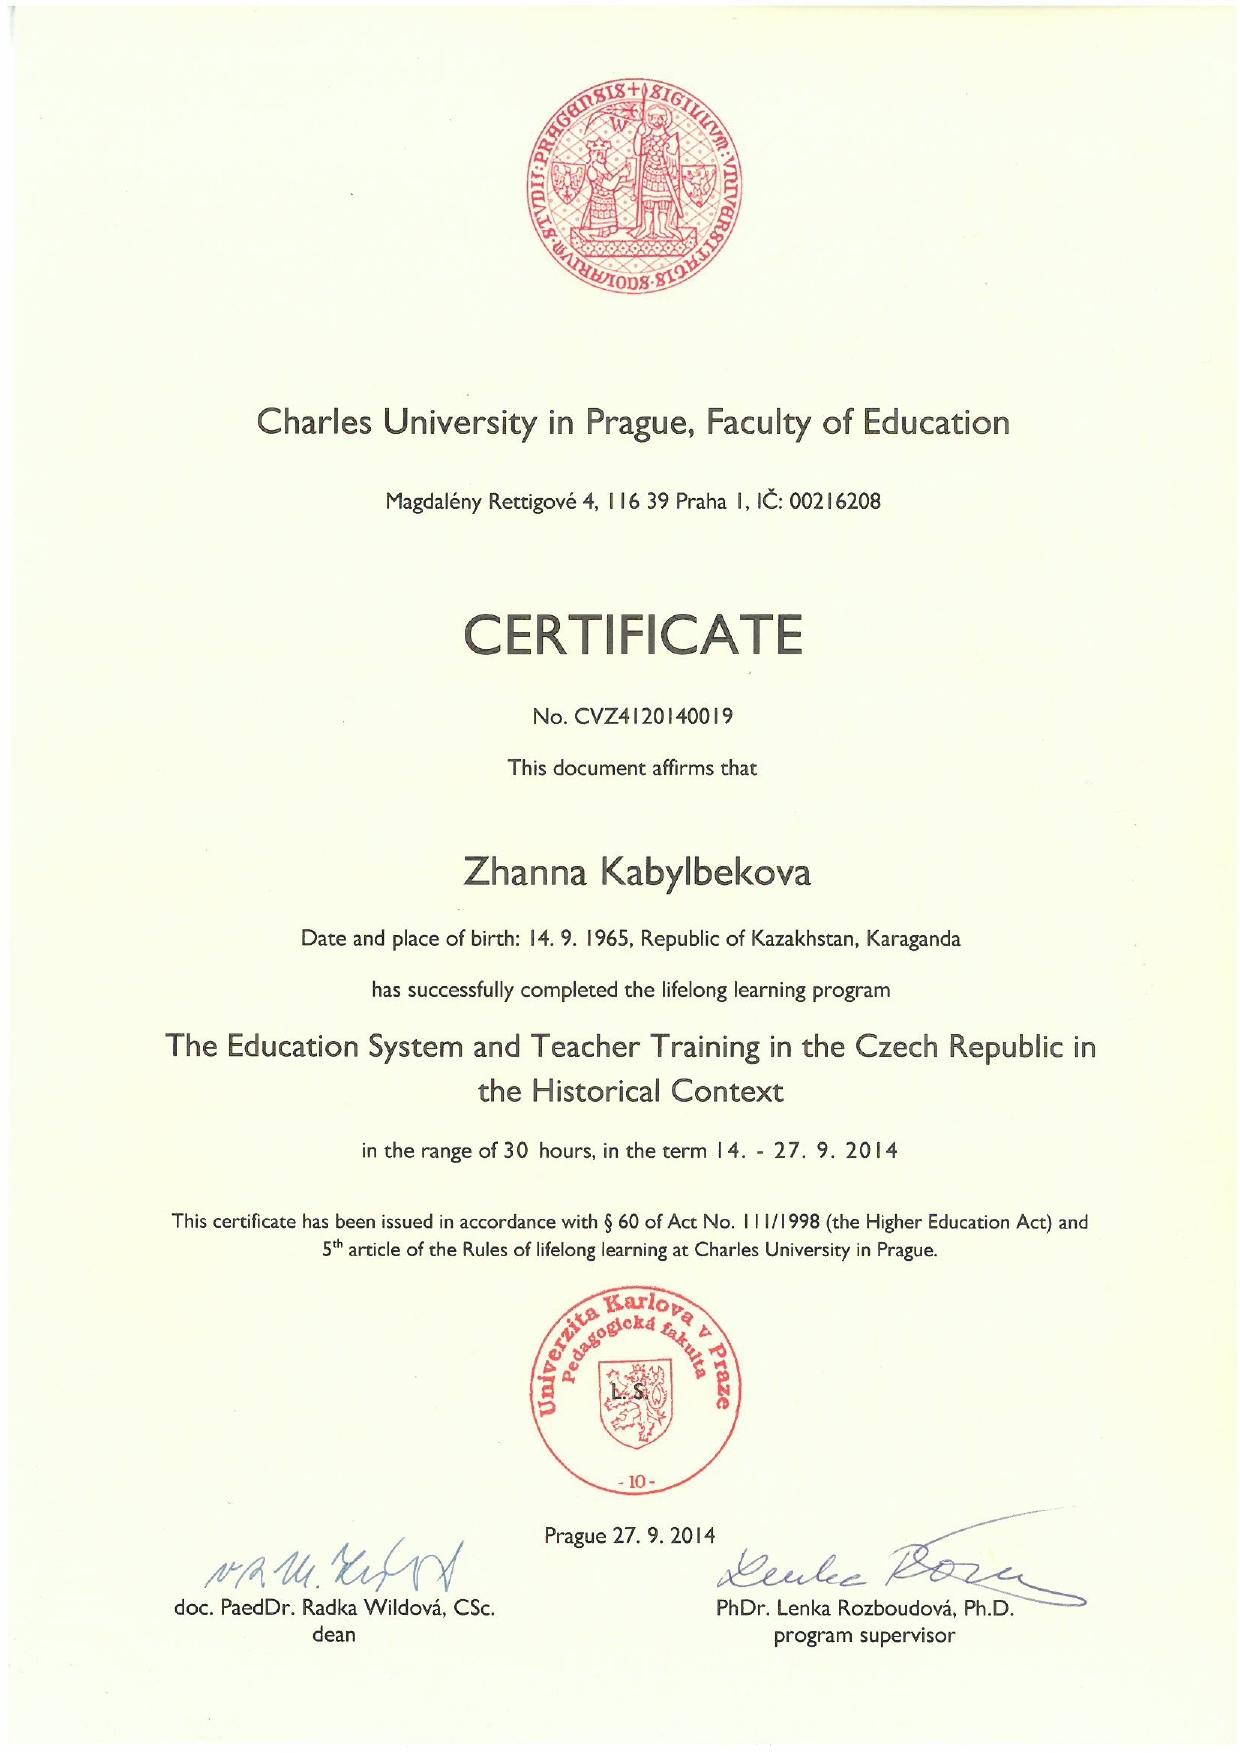 Сертификат Ж.К. Кабылбековой